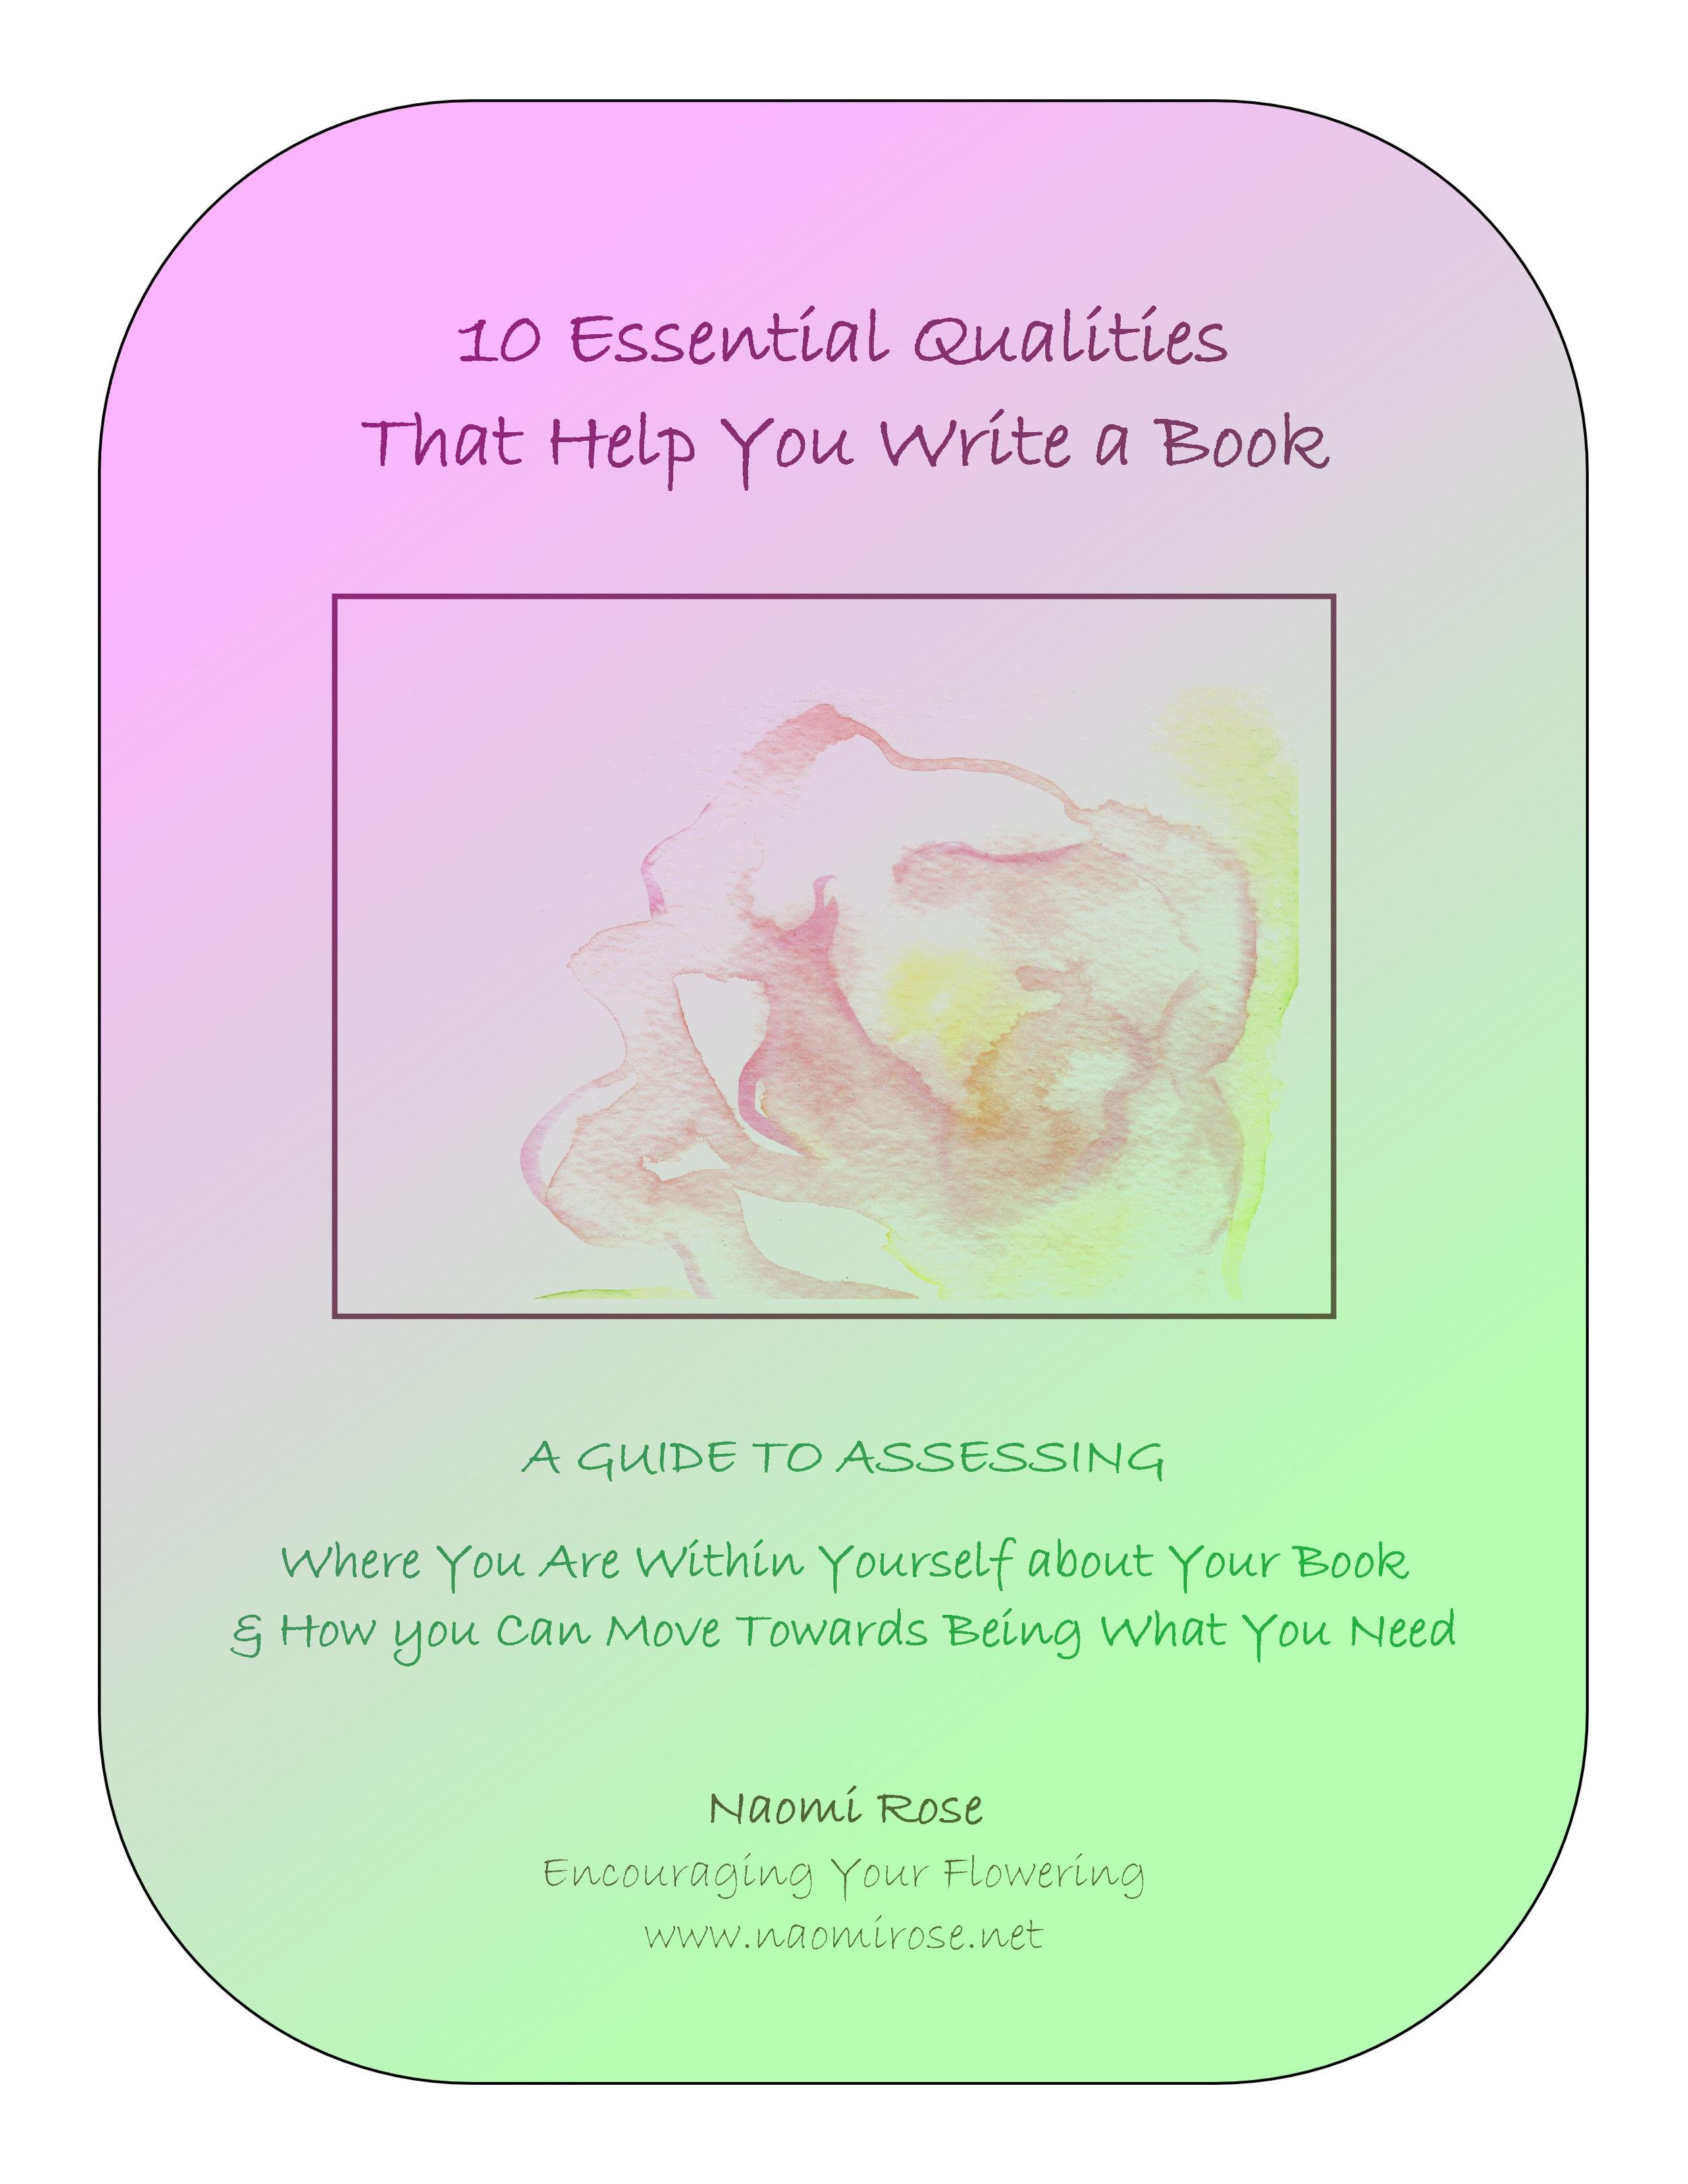 10 Essential Qualities That Help   You Write a Book (Ya Batin cover image).JPG